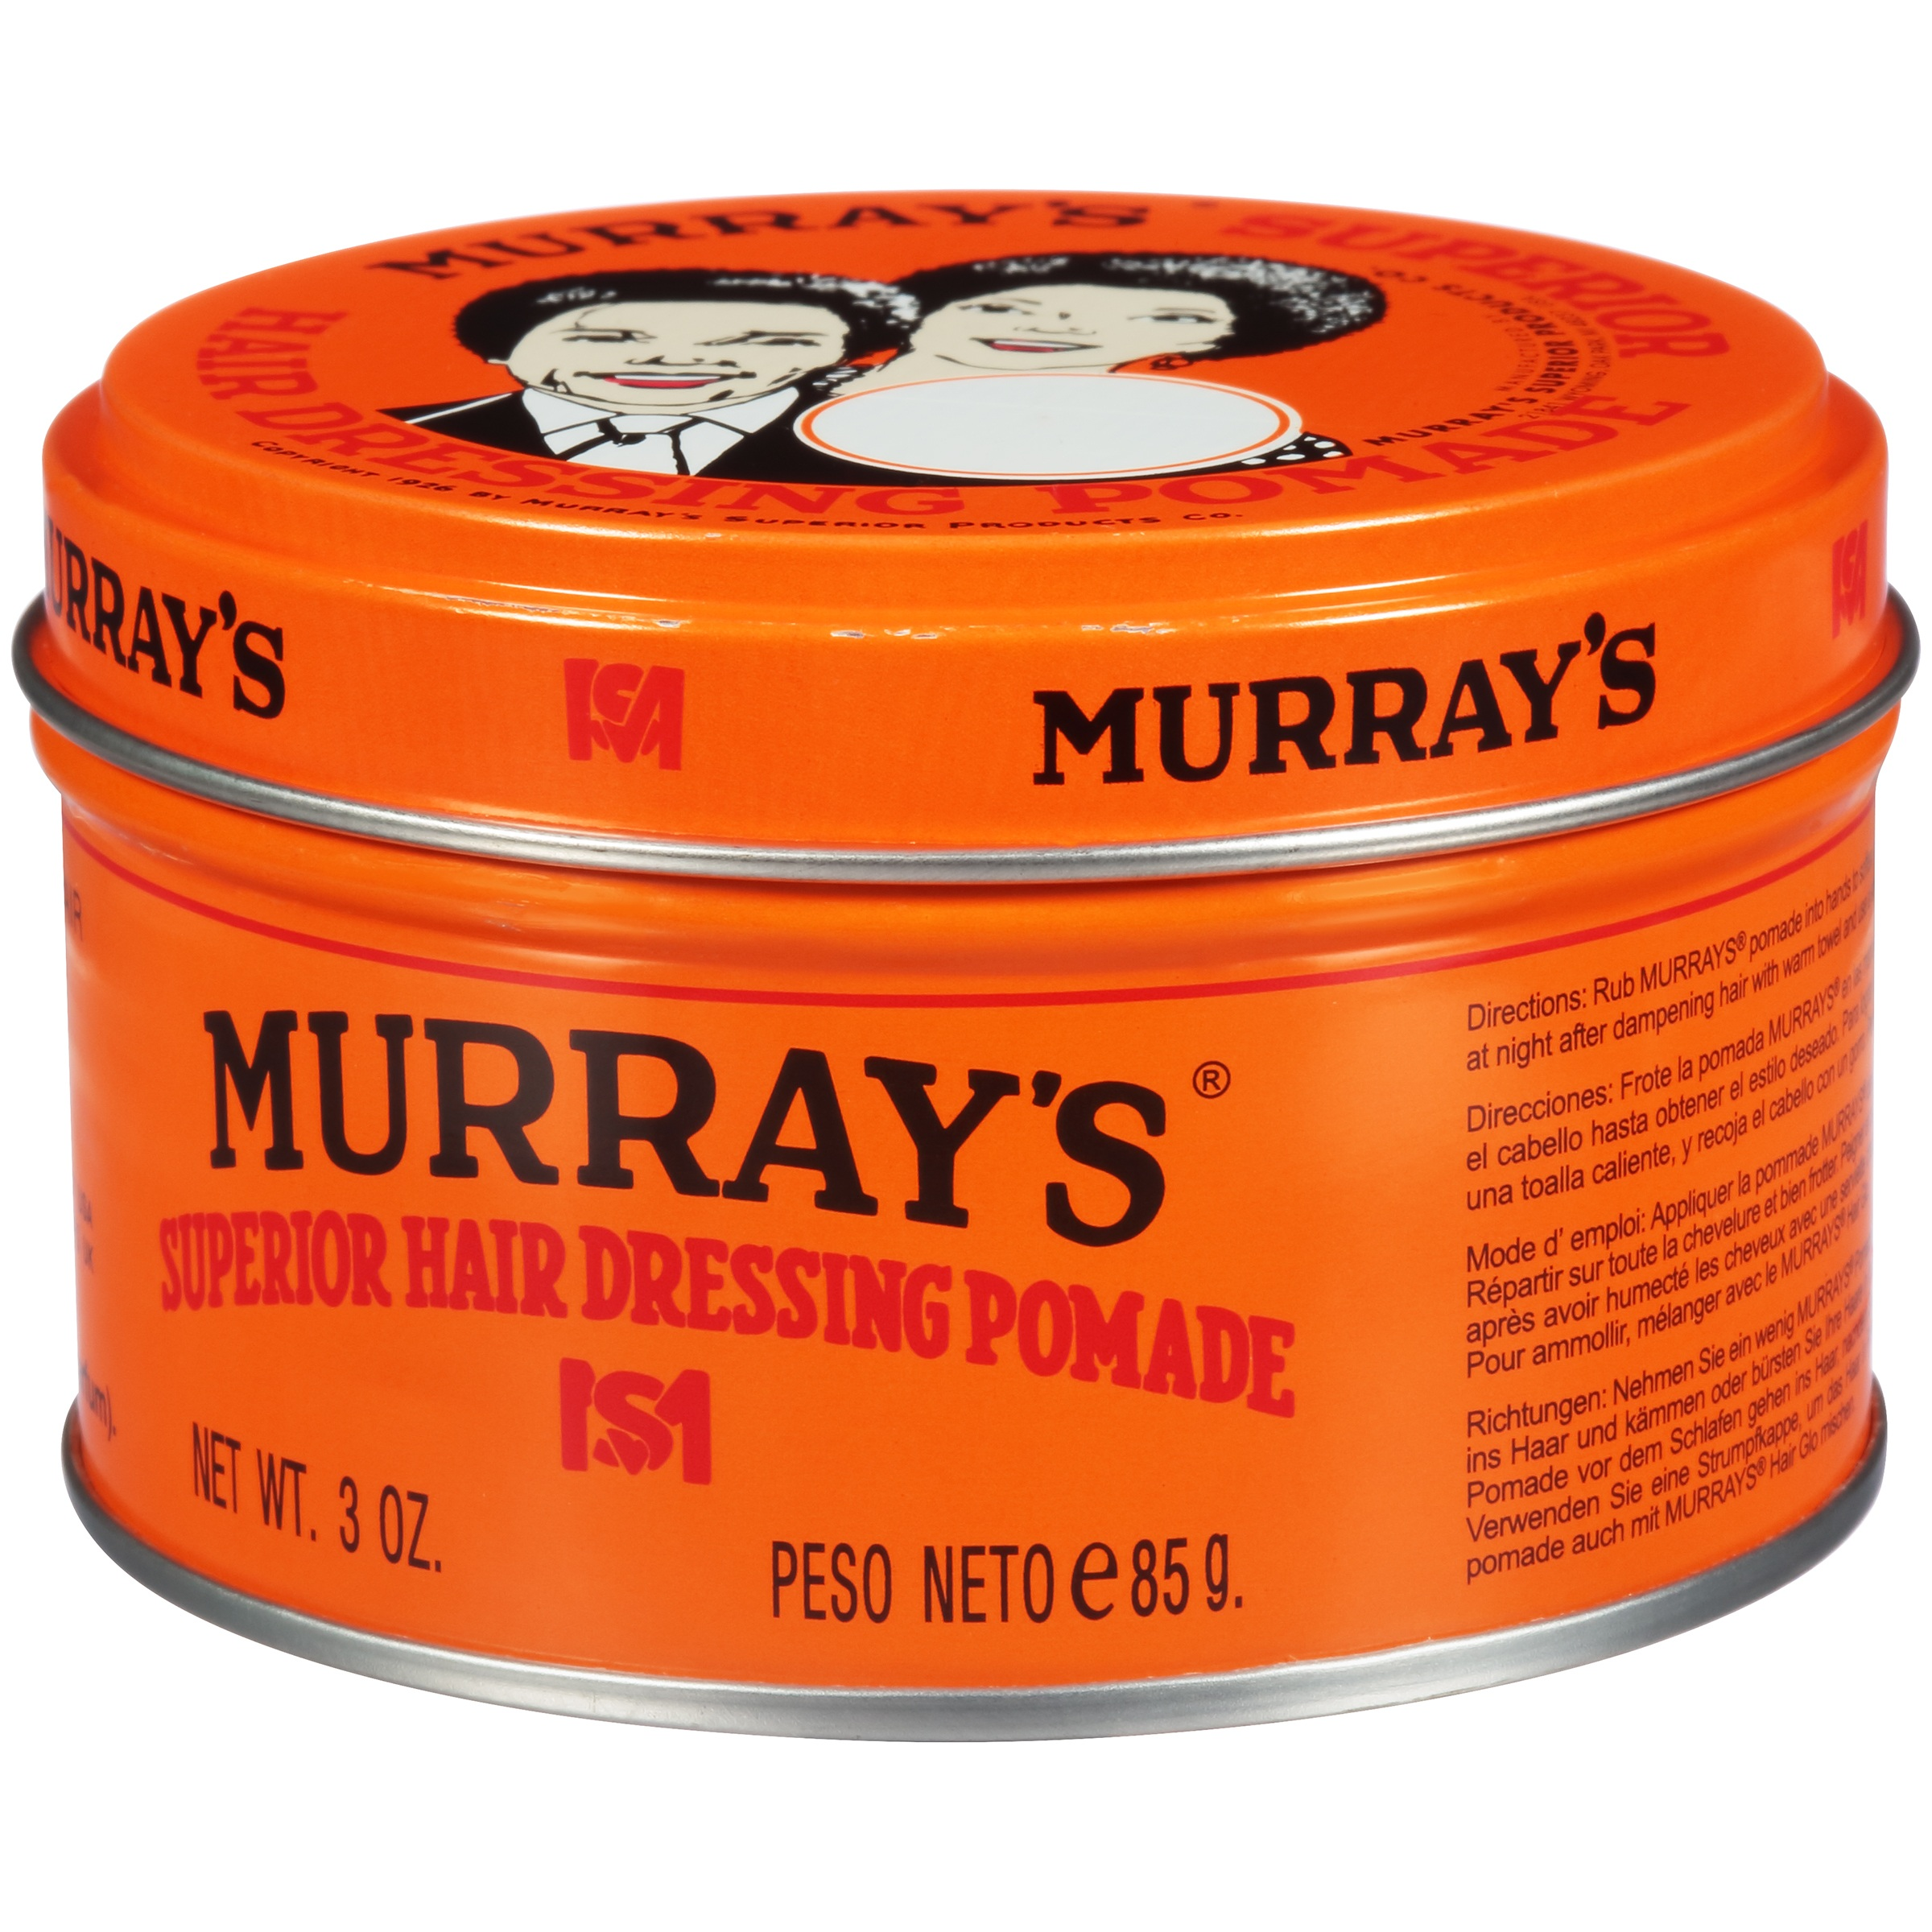 Murray s Superior Hair Dressing Pomade 52ef5c5693